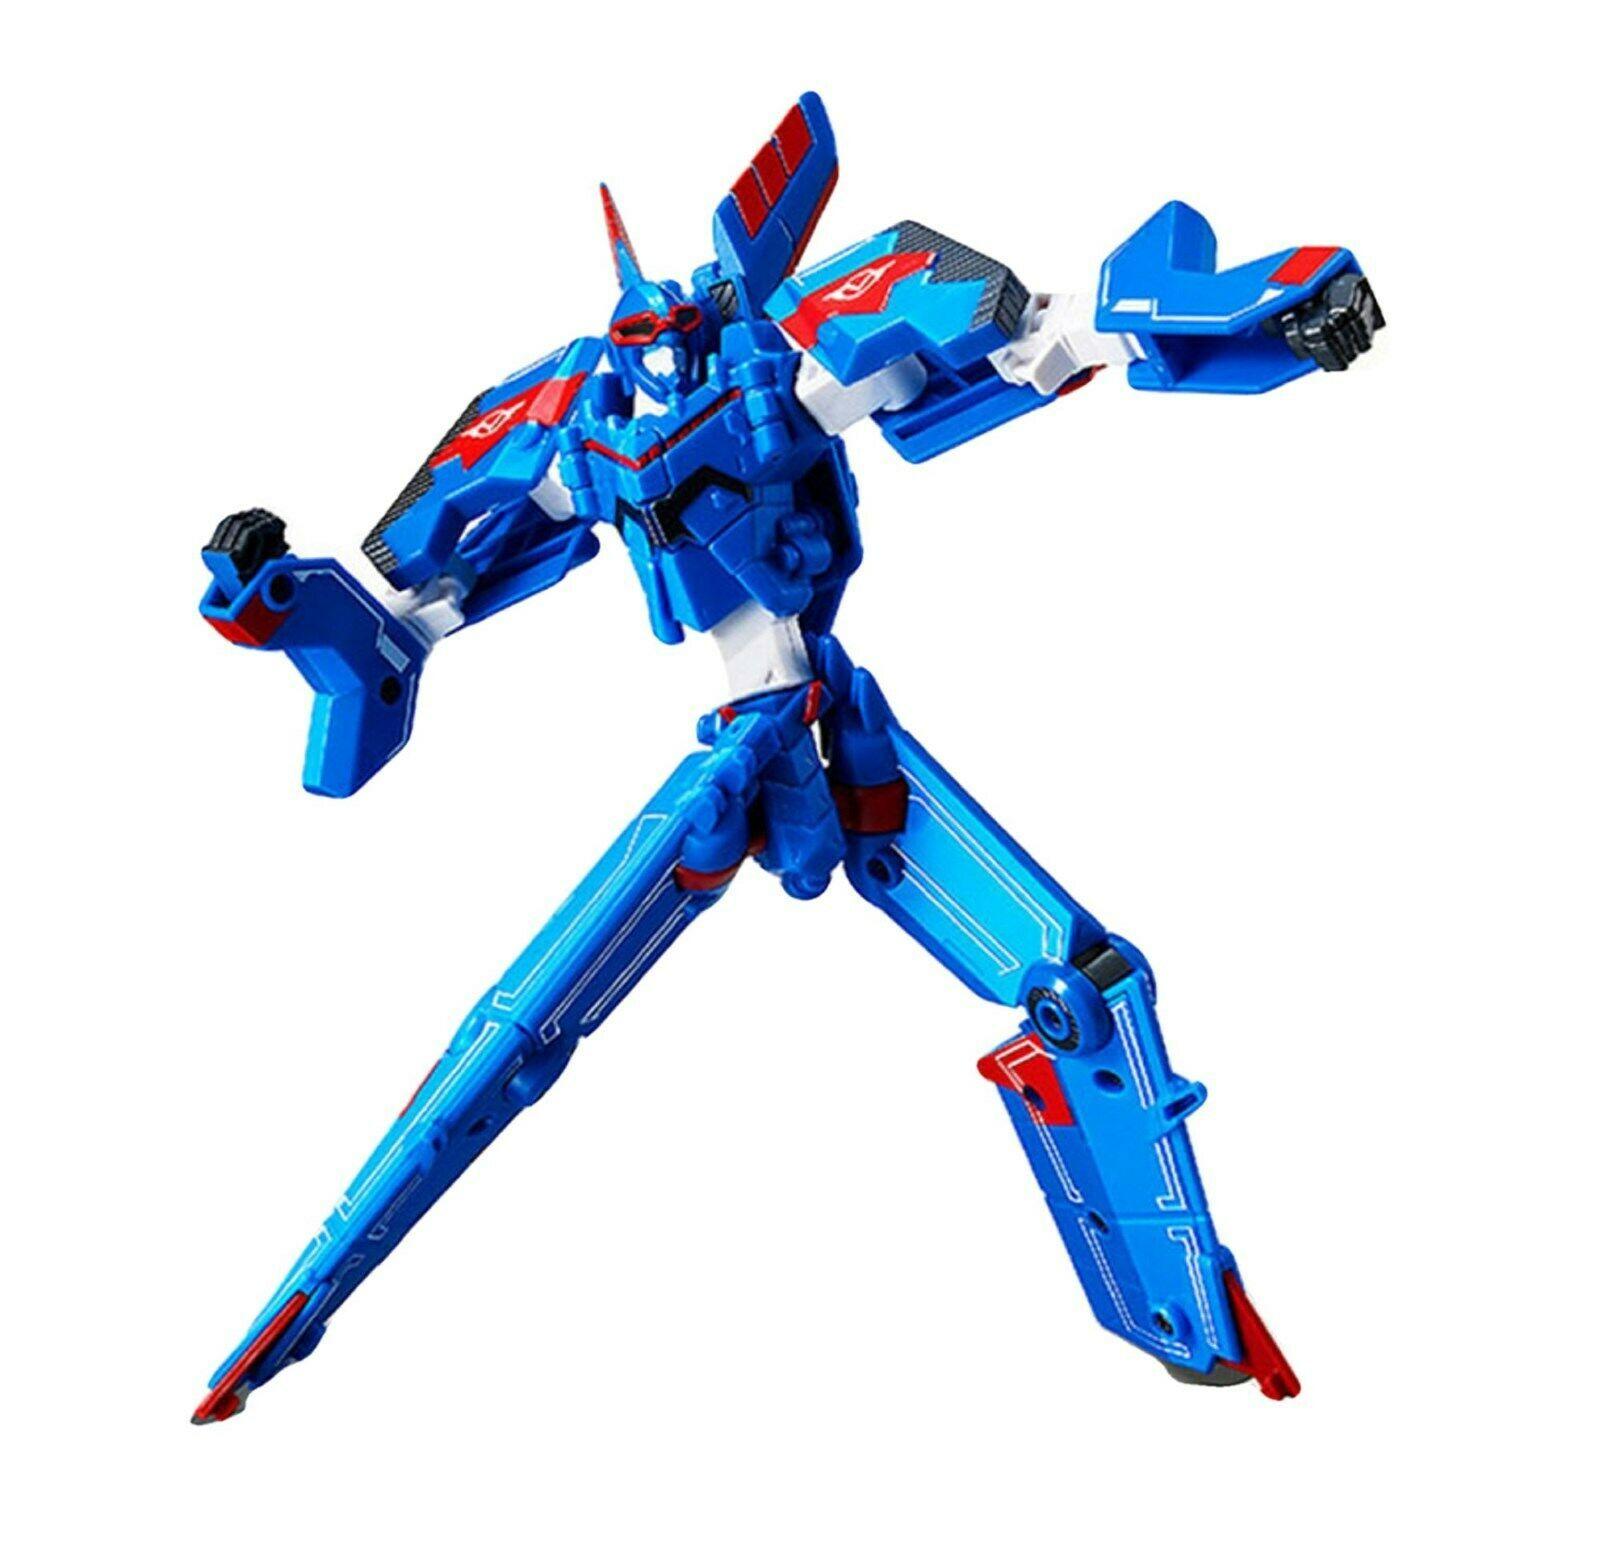 Tobot V Sonic Stealth Action Figure Fighter Plane Transforming Robot Toy